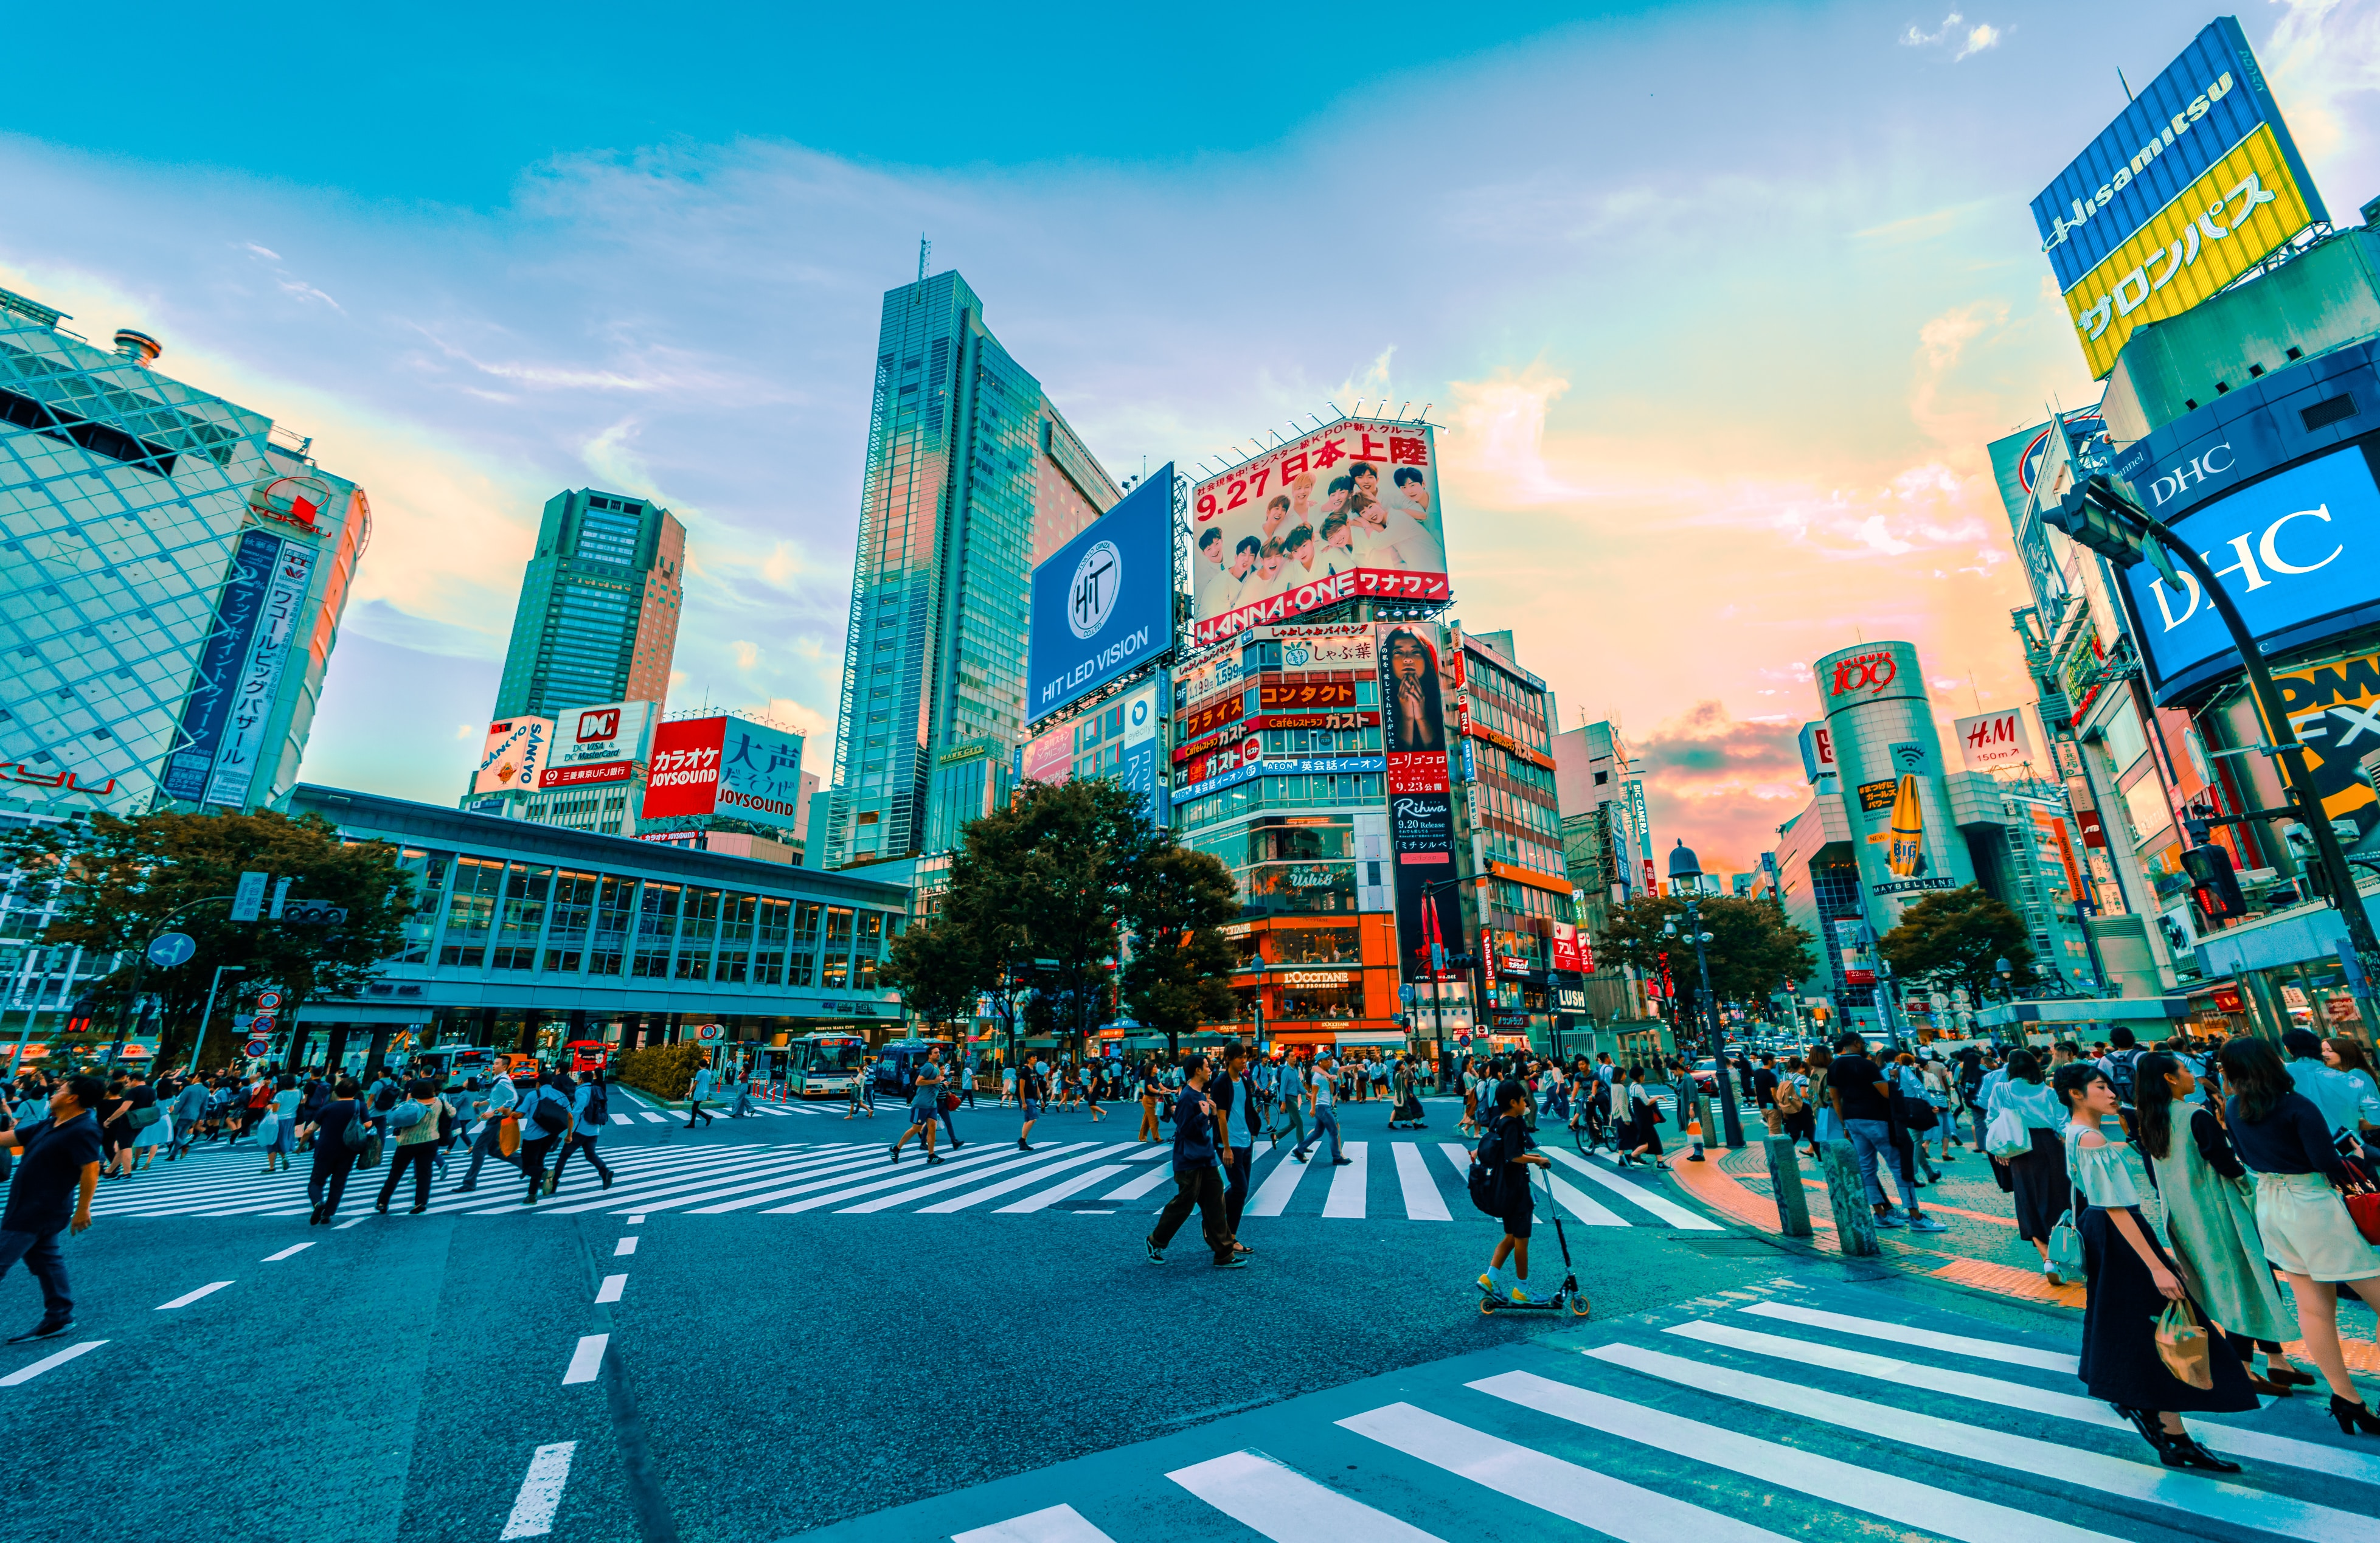 Japón registró un déficit comercial de 2,490 mdd en febrero